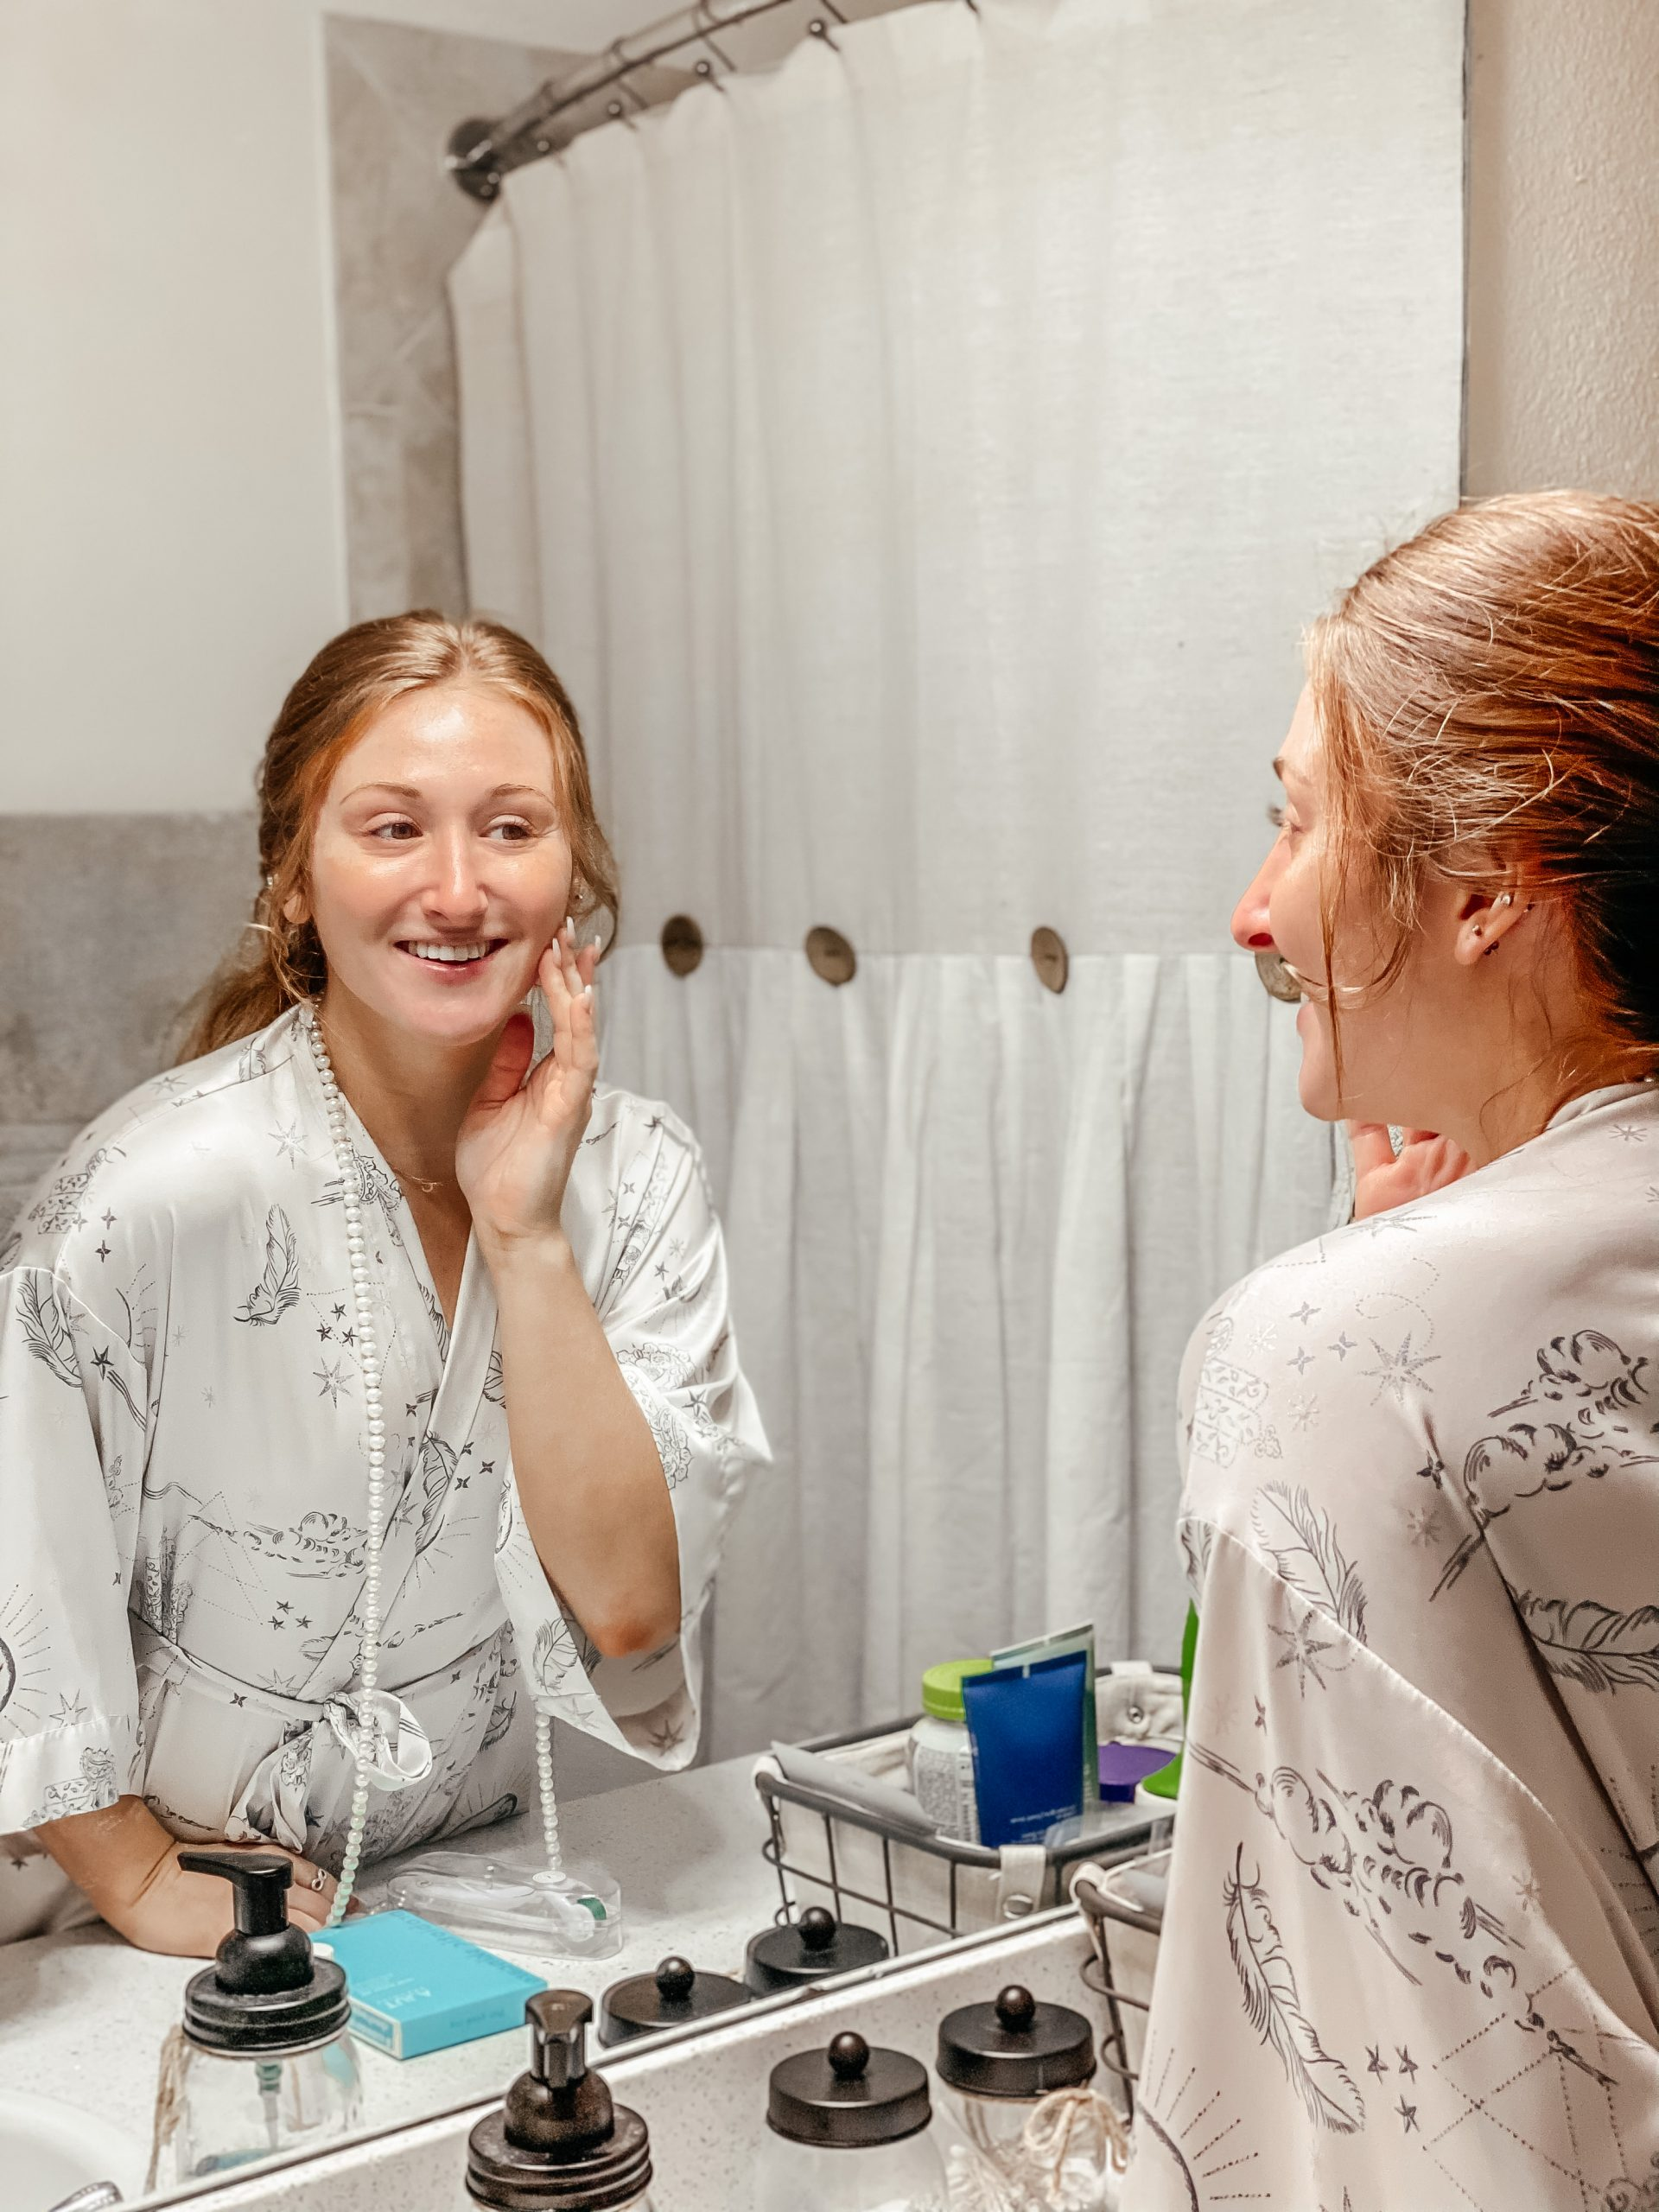 Carrington with acne skincare products like the Tula exfoliating skincare pads.